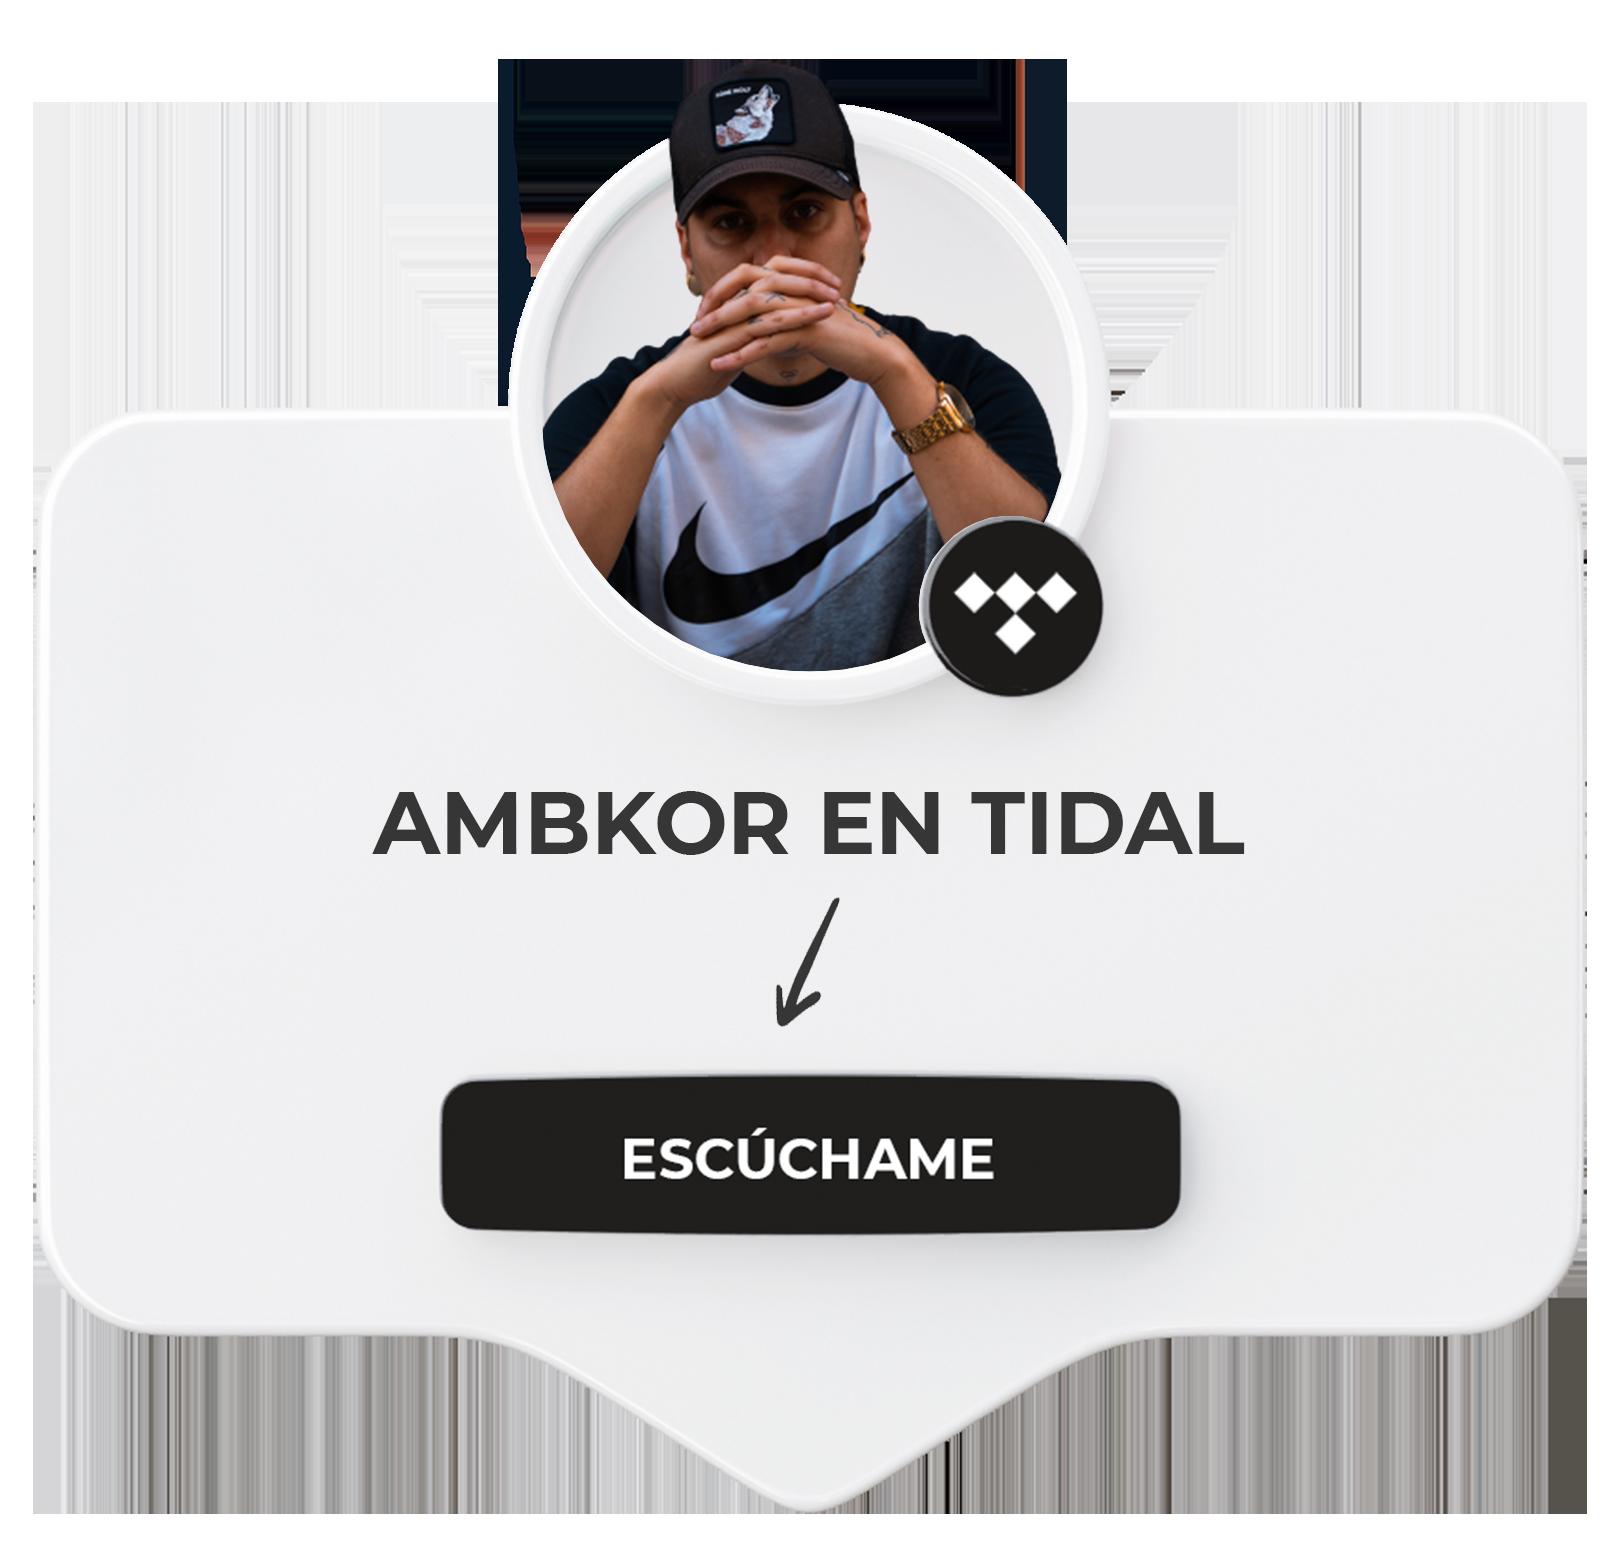 Ambkor en Tidal